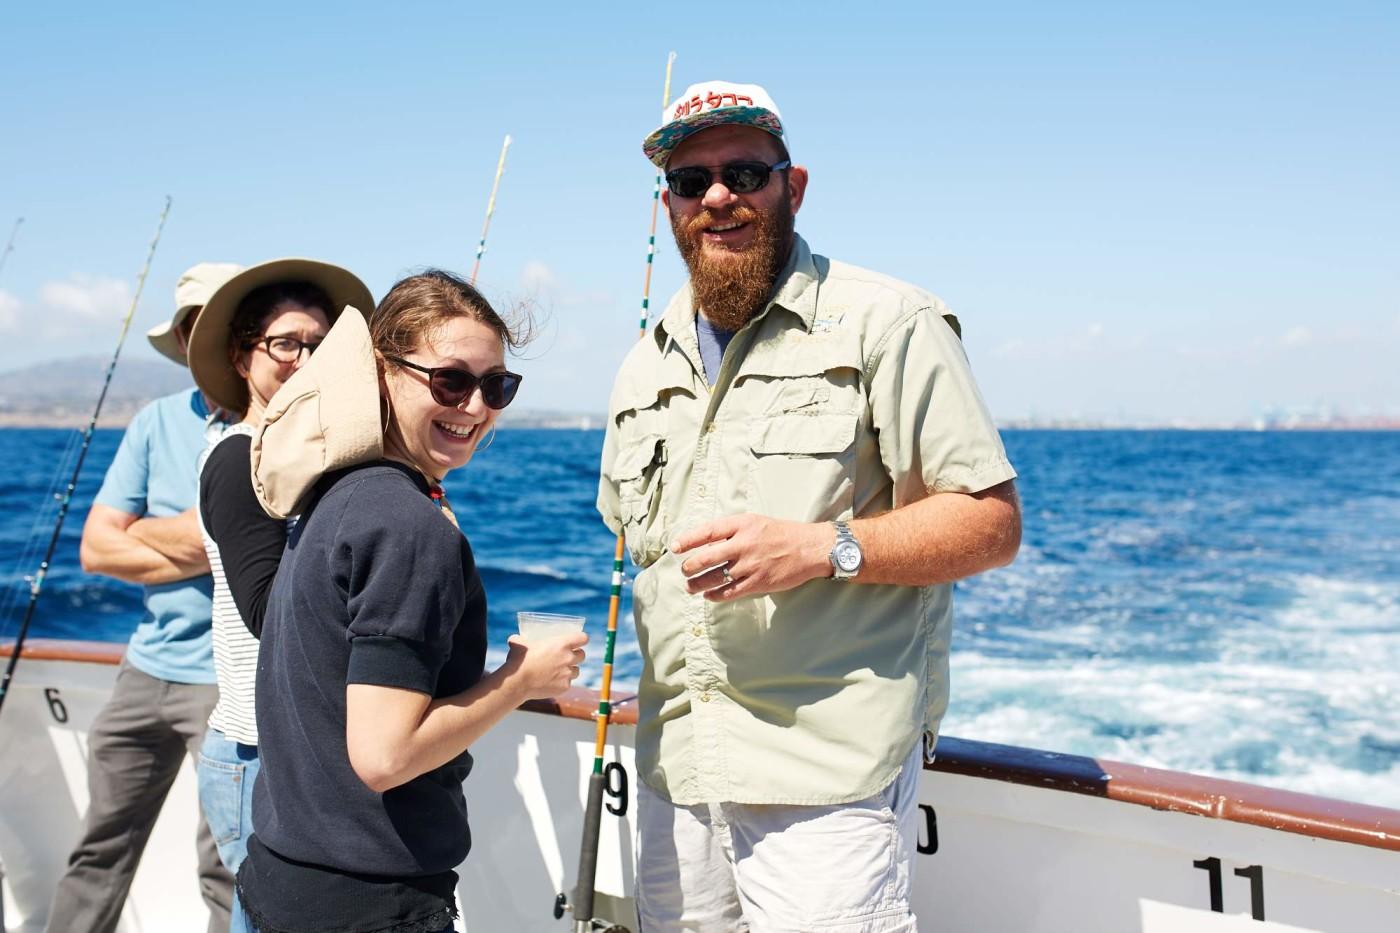 meeno-LUCY-FISHING-_H1A3754_o